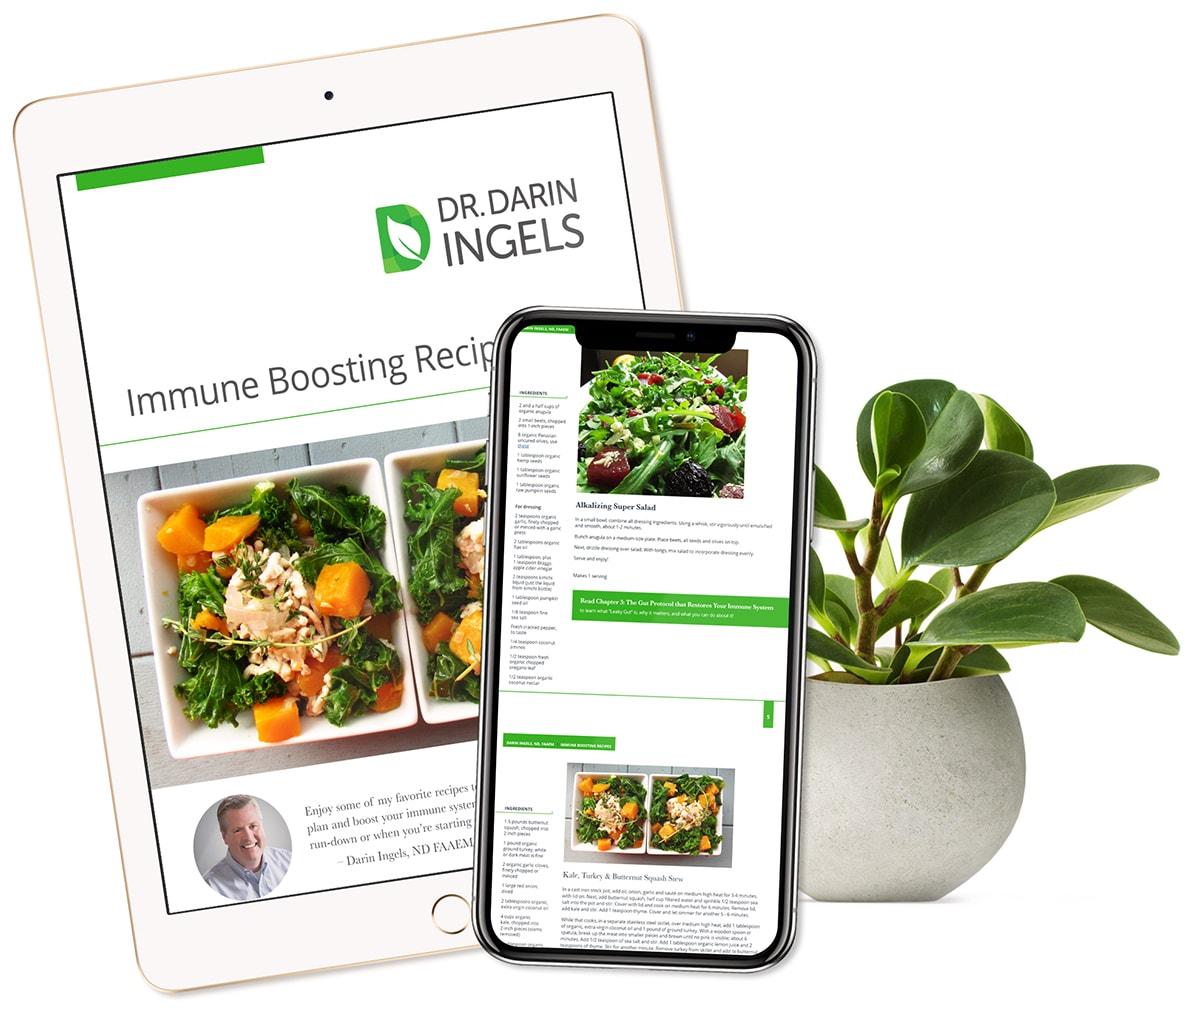 Free recipe ebook on an ipad and iphone